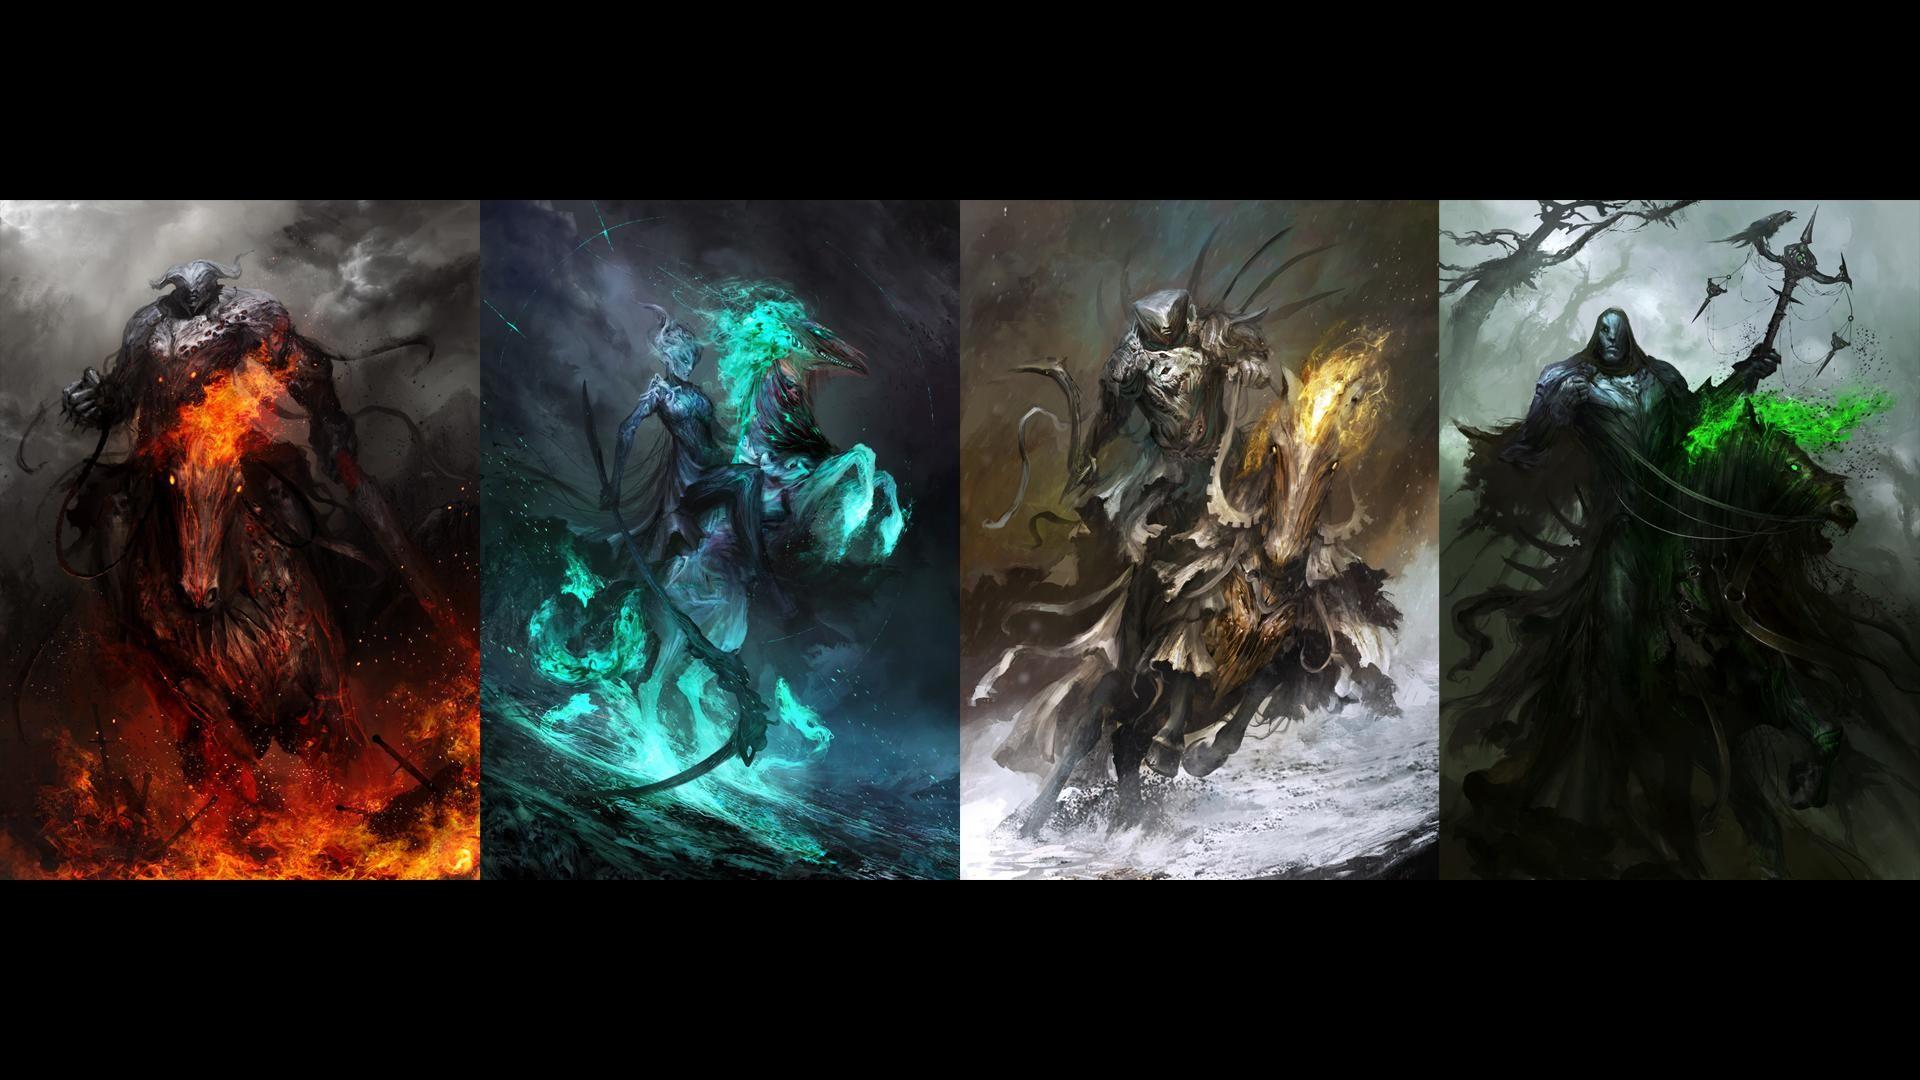 Darksiders Four Horsemen Wallpaper 85 Images